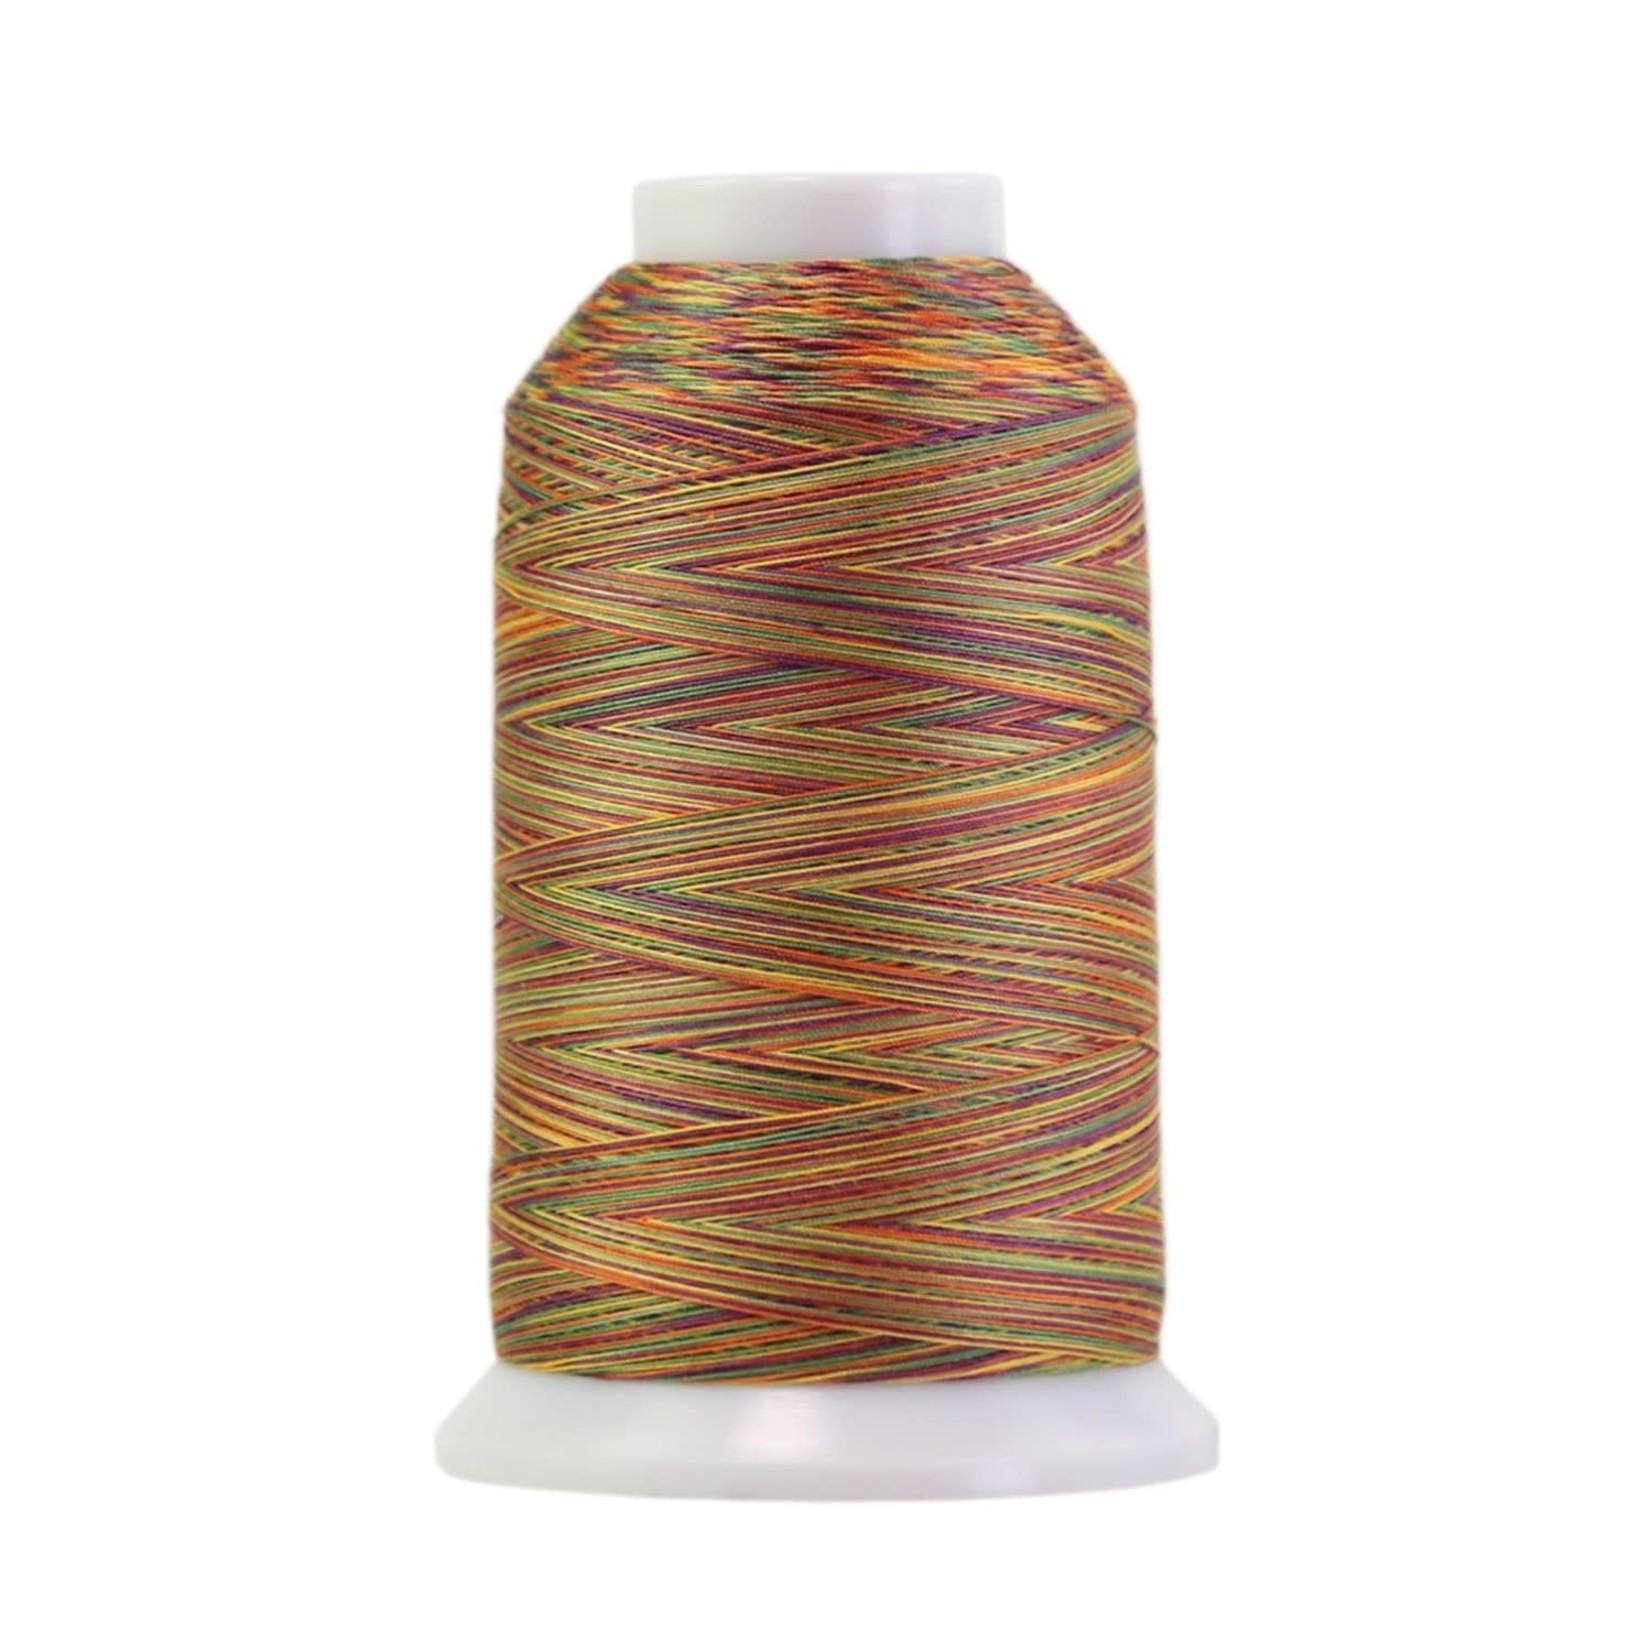 Superior Threads King Tut - #40 - 1828 m - 1059 Market Place